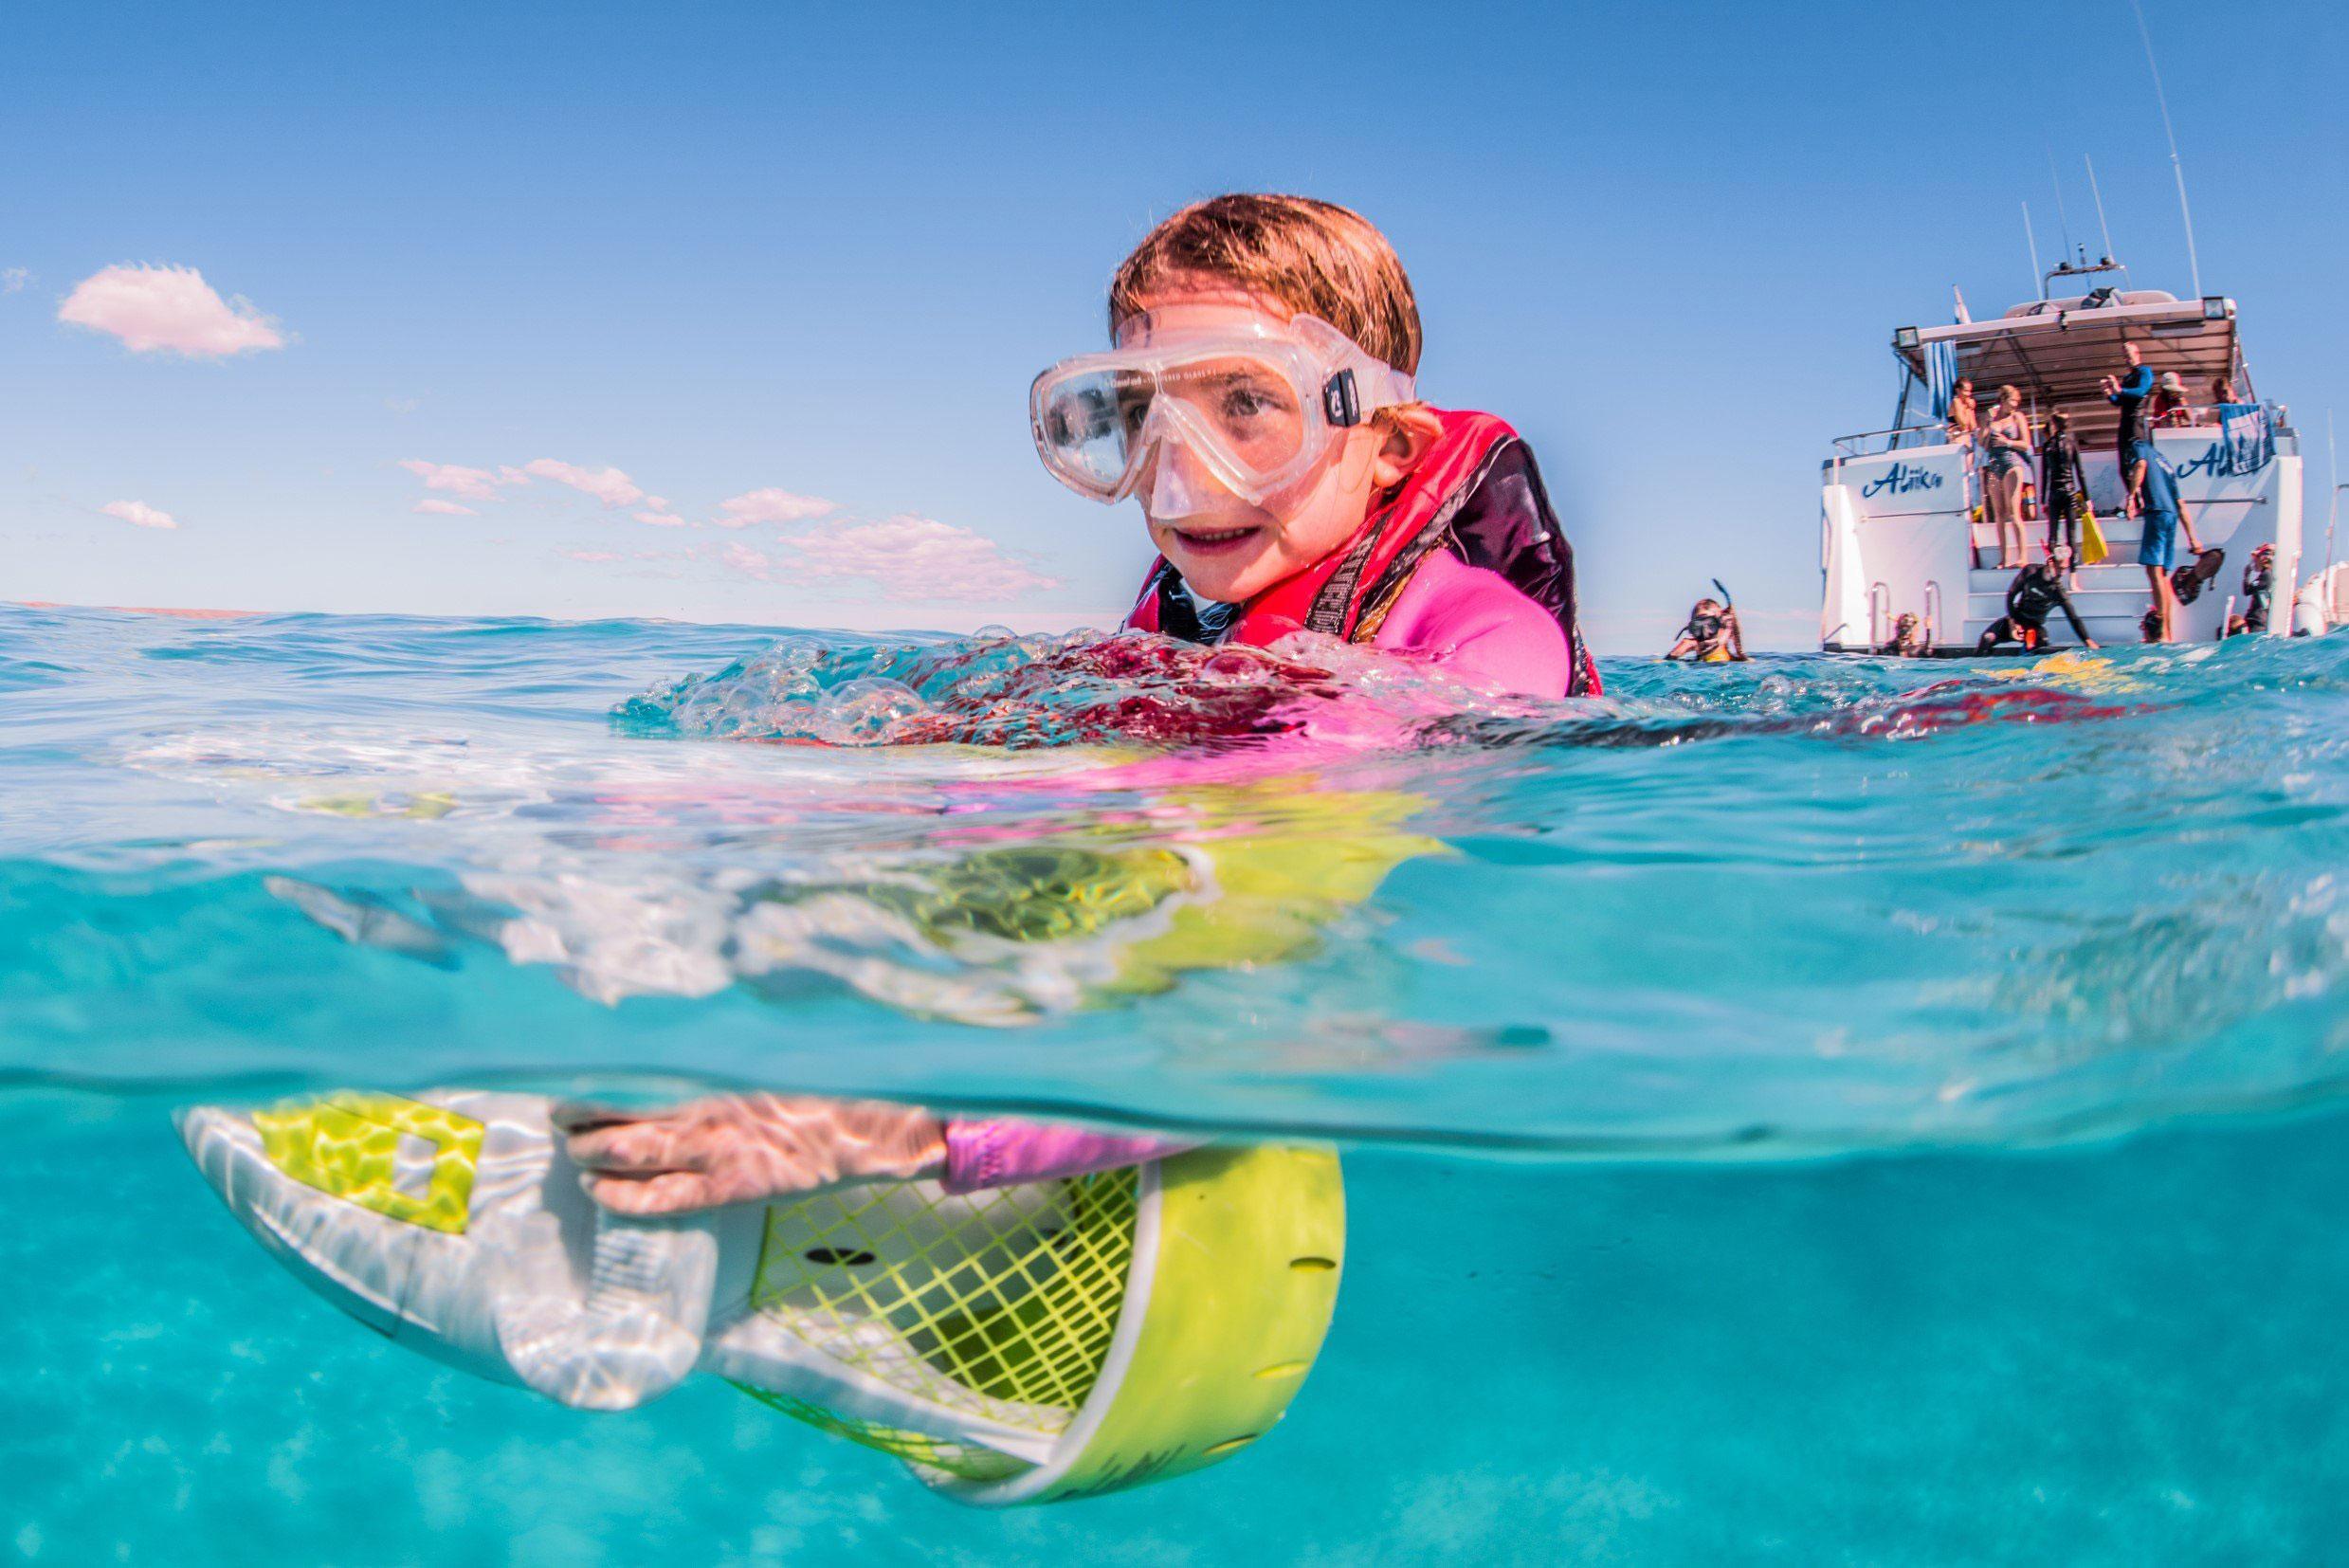 HERON-whale-shark-swim-girl-child-in-water